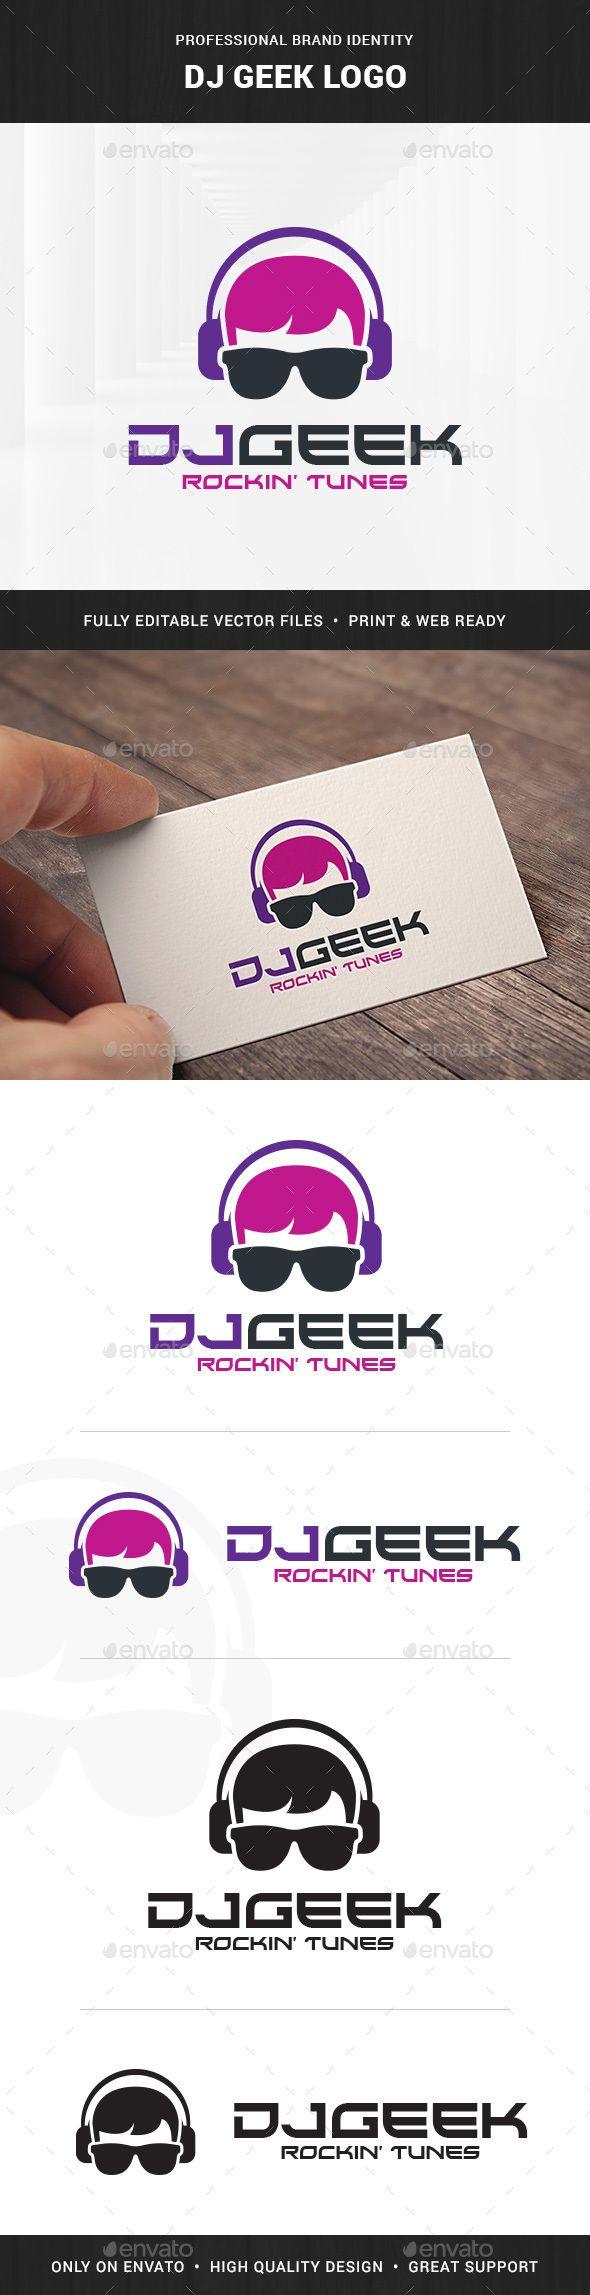 dj logo template psd - Selo.l-ink.co